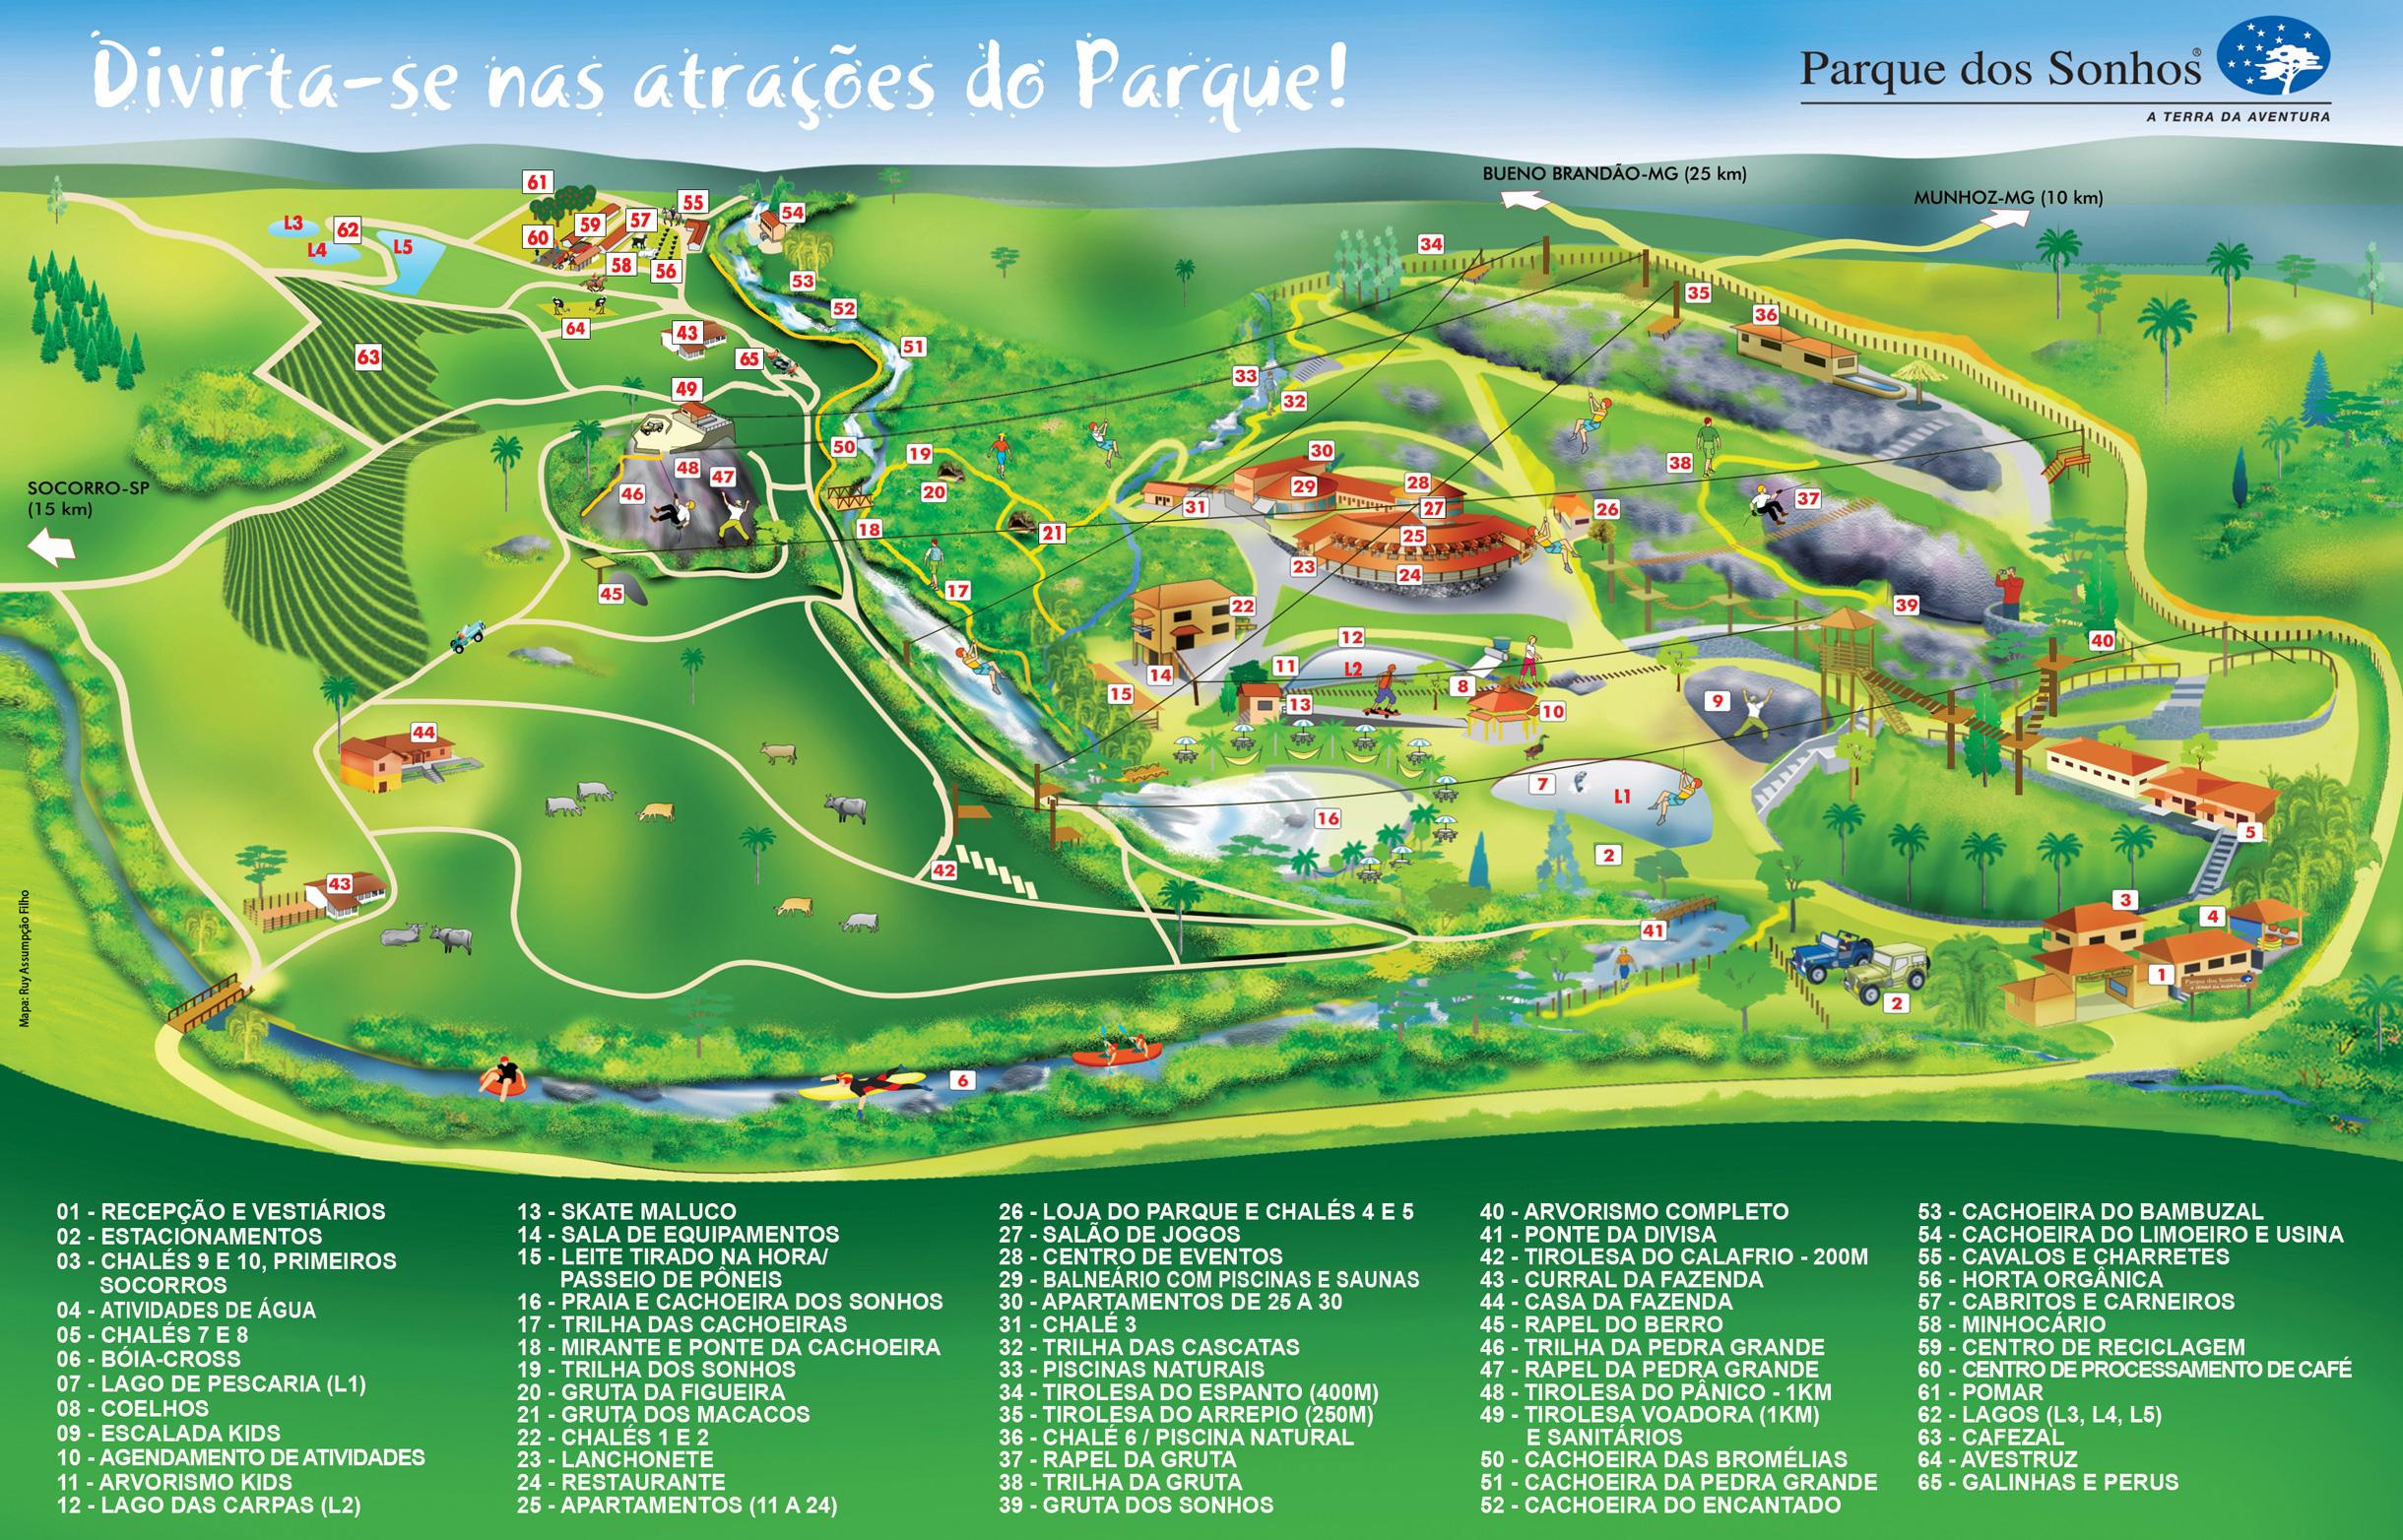 Mapa de toda a infraestrutura do parque dos sonhos, onde mostra todas as atividades e predios do hotel